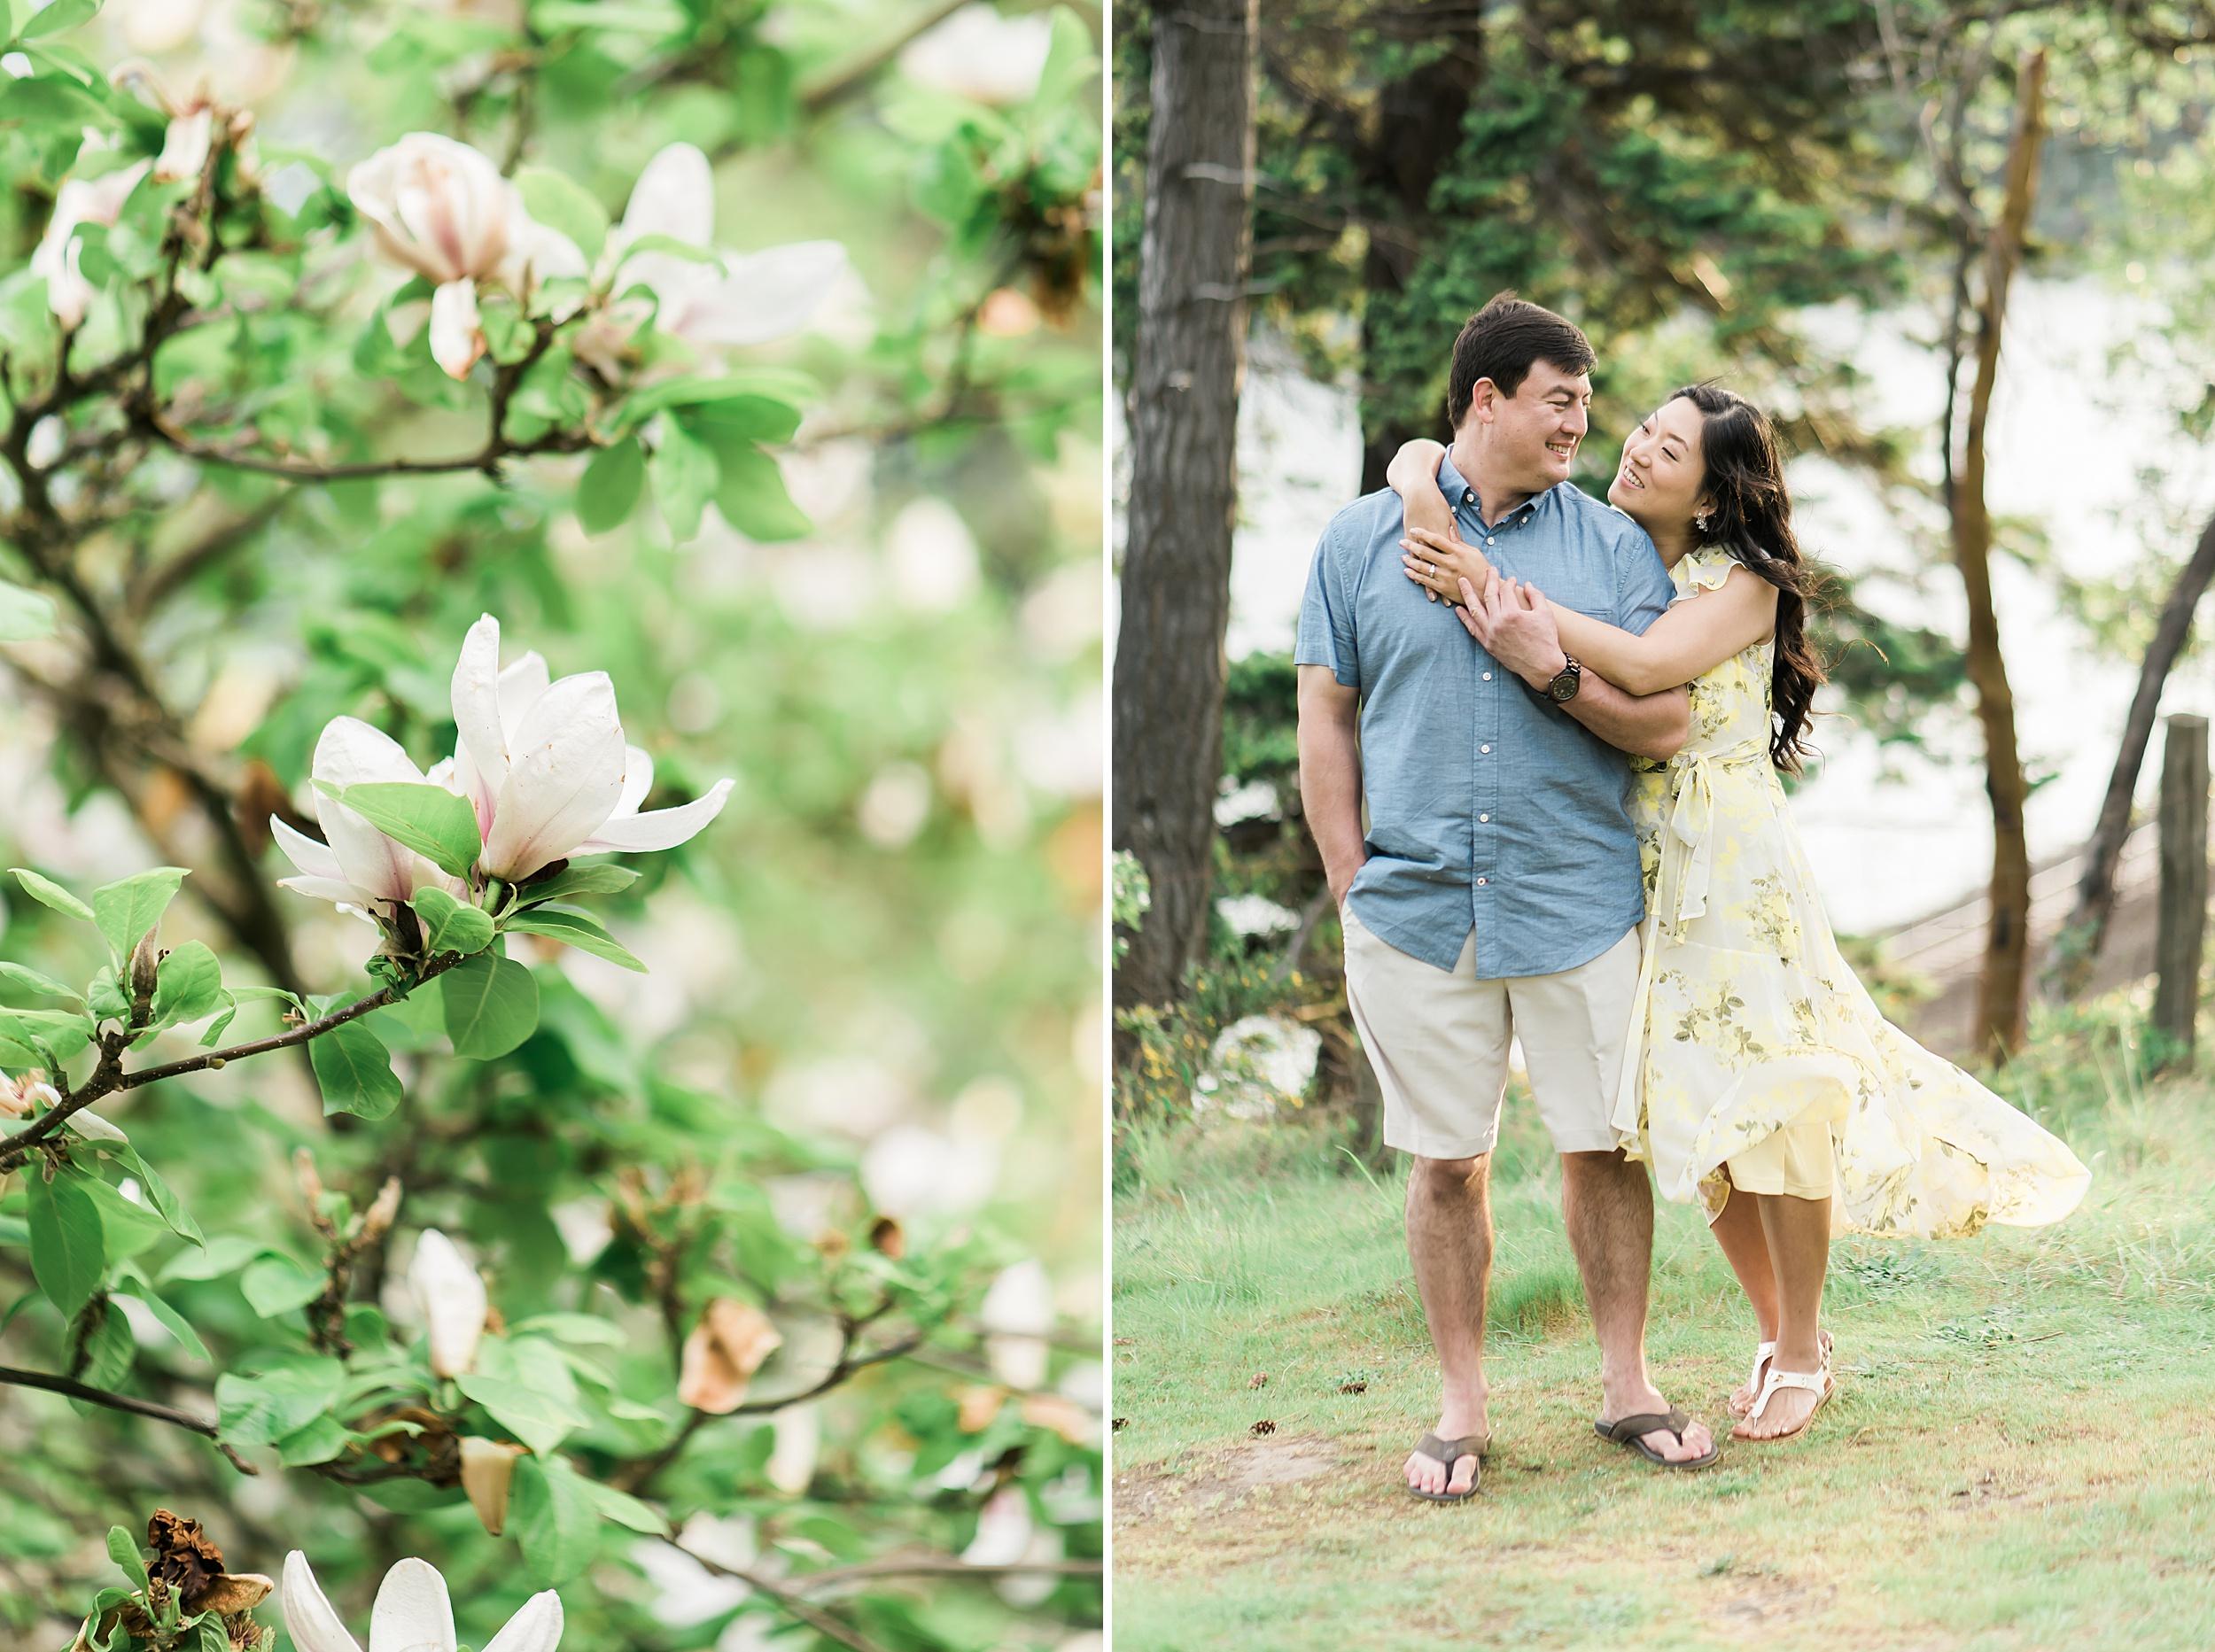 Woodstock Farm Engagement wedding photos